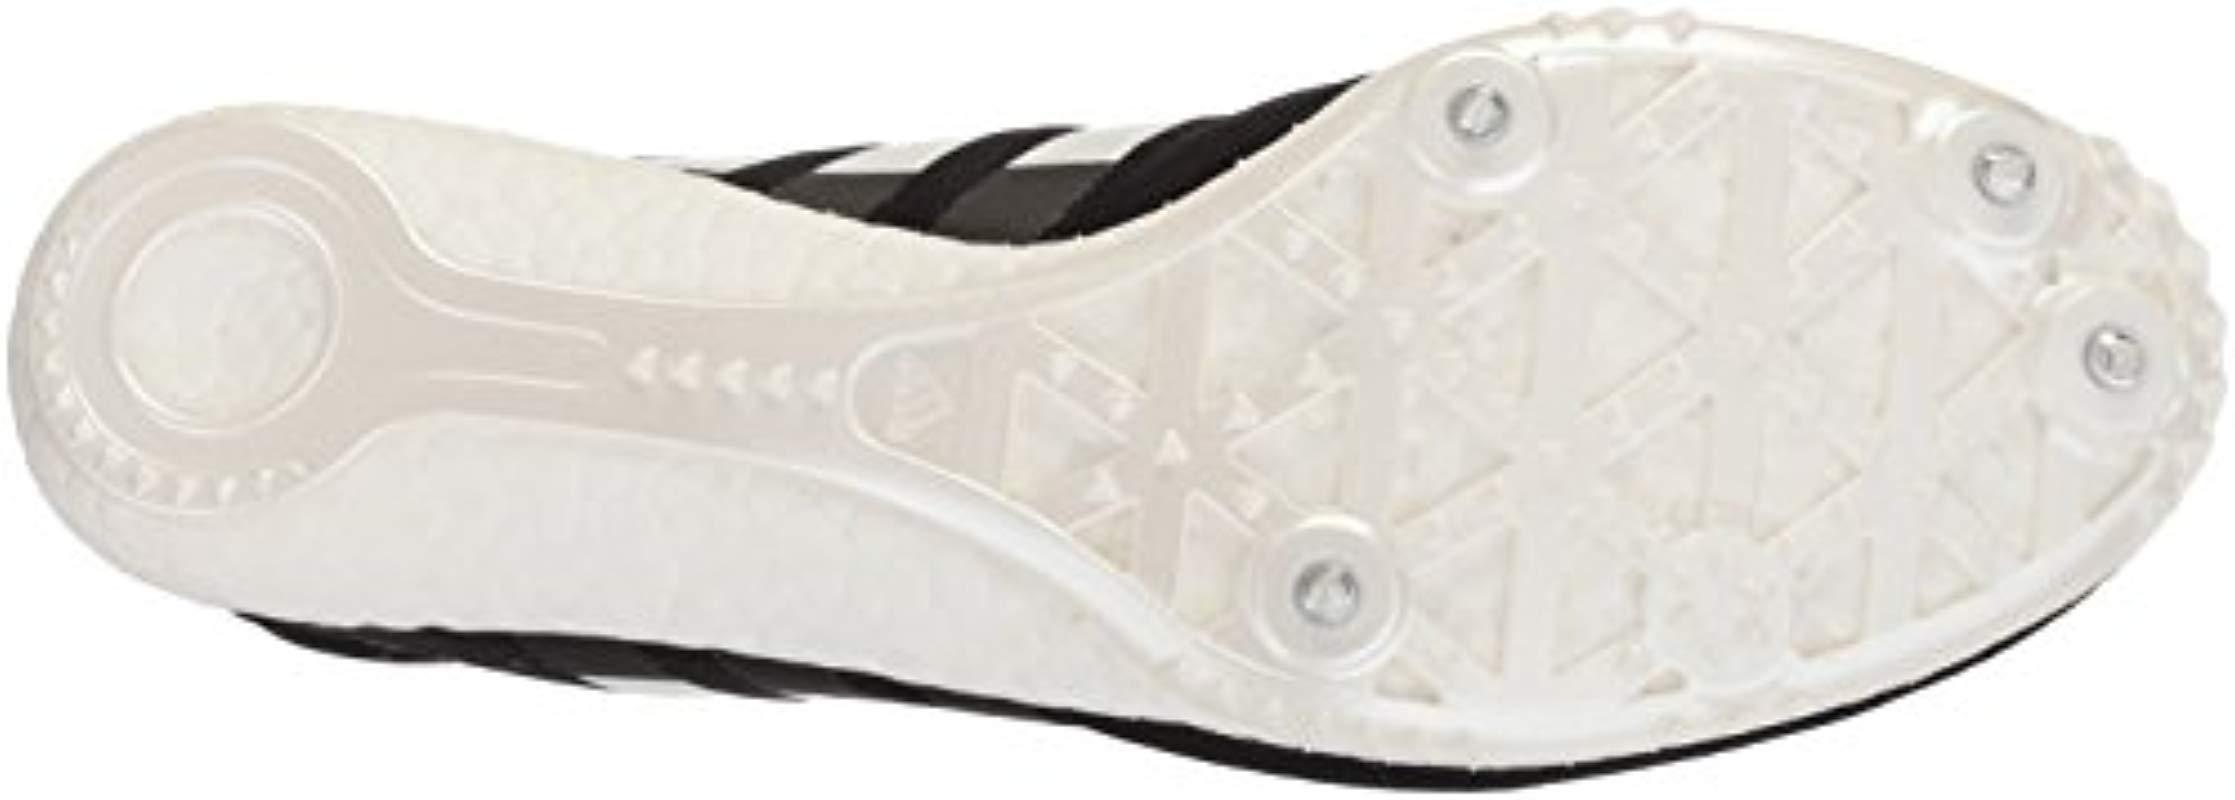 finest selection 1169b 81c44 Lyst Adidas Adizero Avanti Track Shoe In Black For Men Save 9